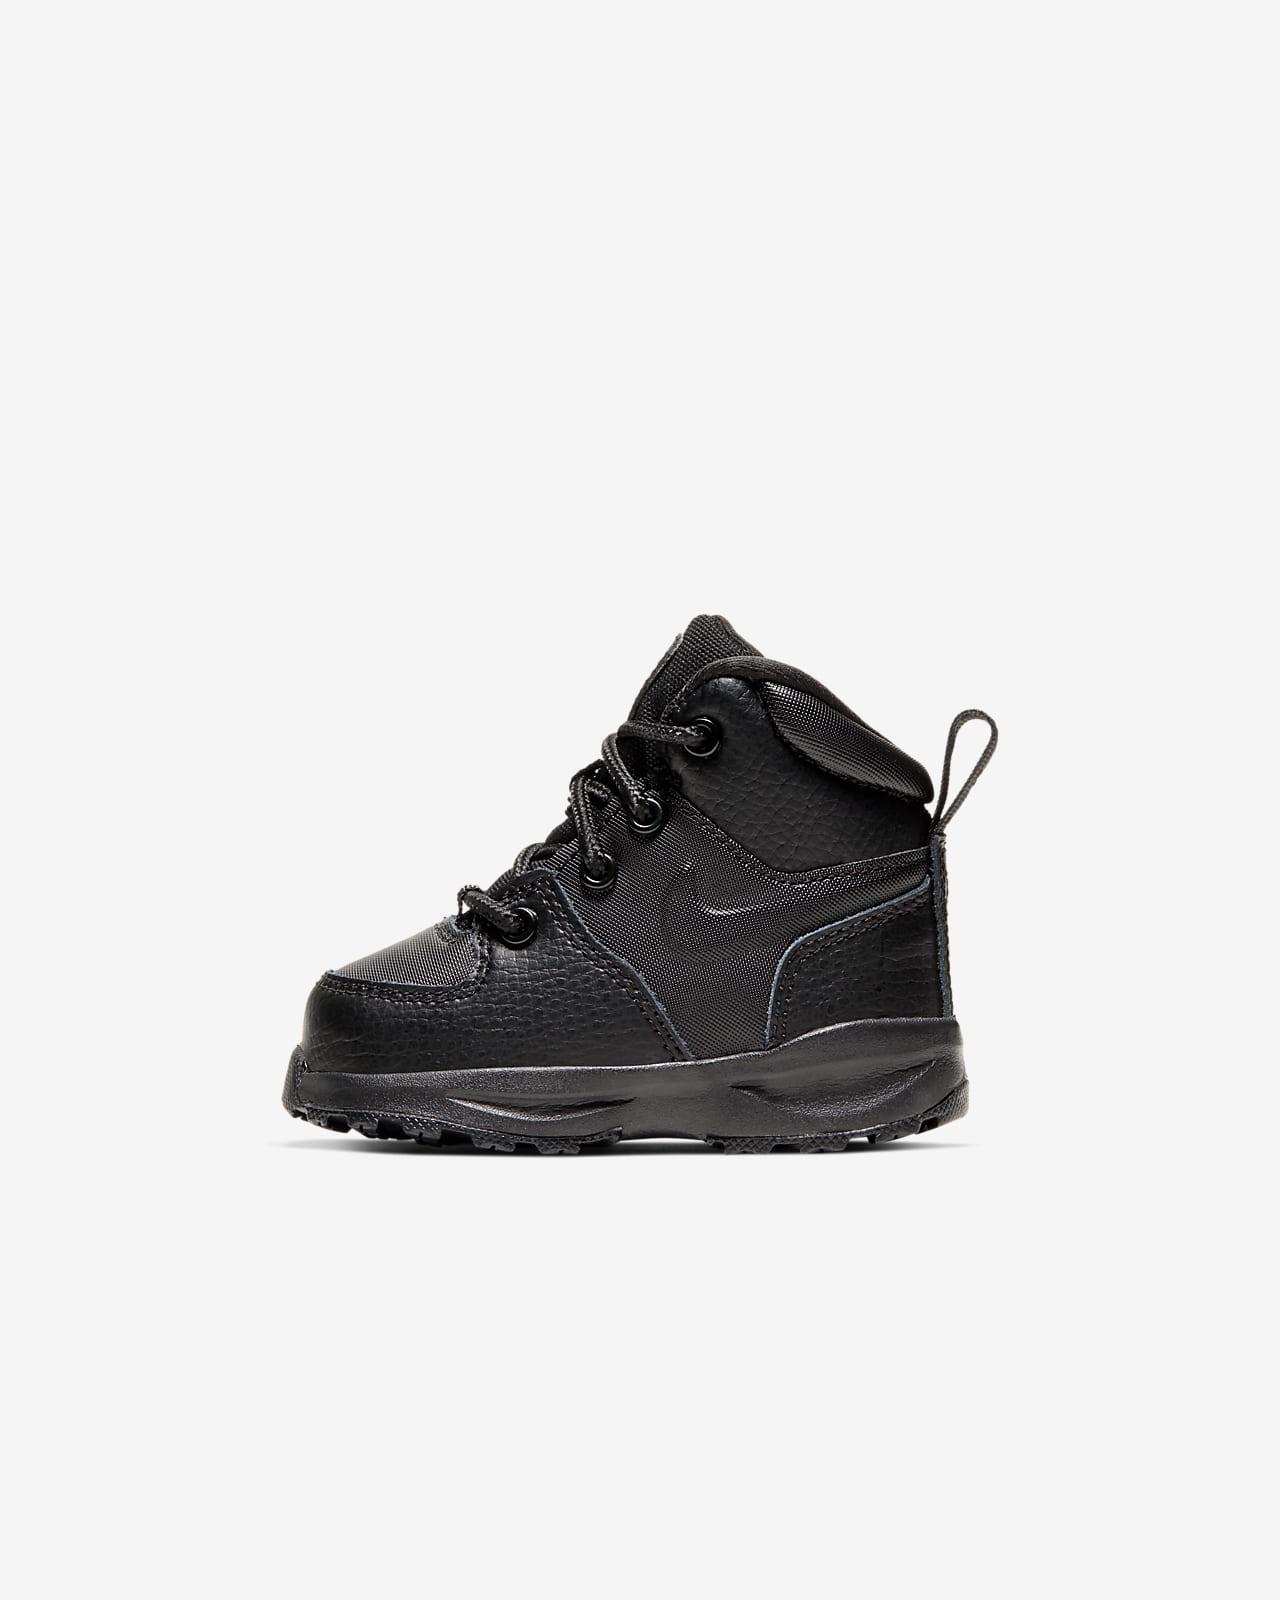 Nike Manoa sko til sped-/småbarn